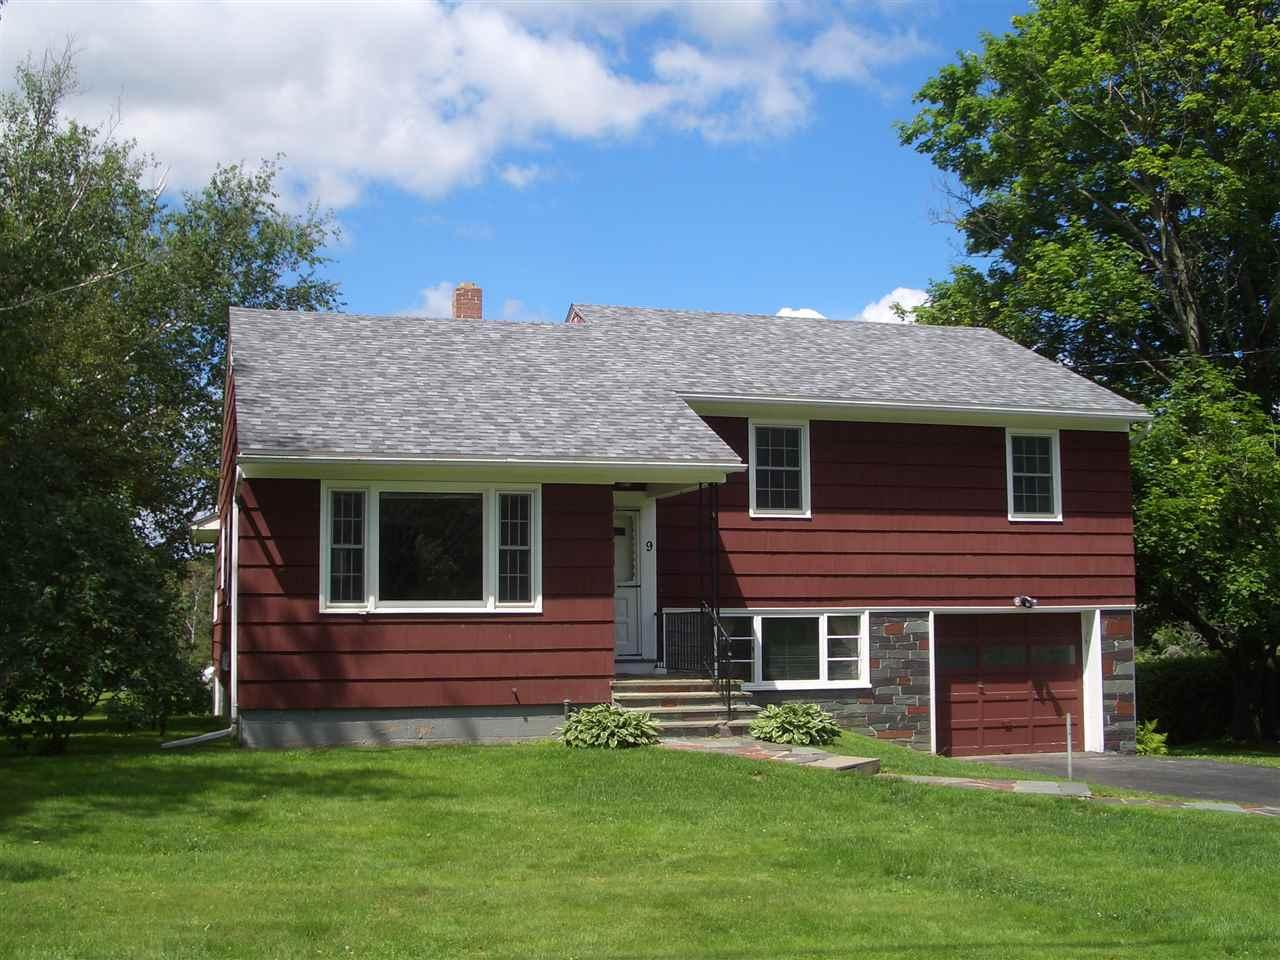 9 Southern Blvd Rutland Vt Mls 4643111 Better Homes